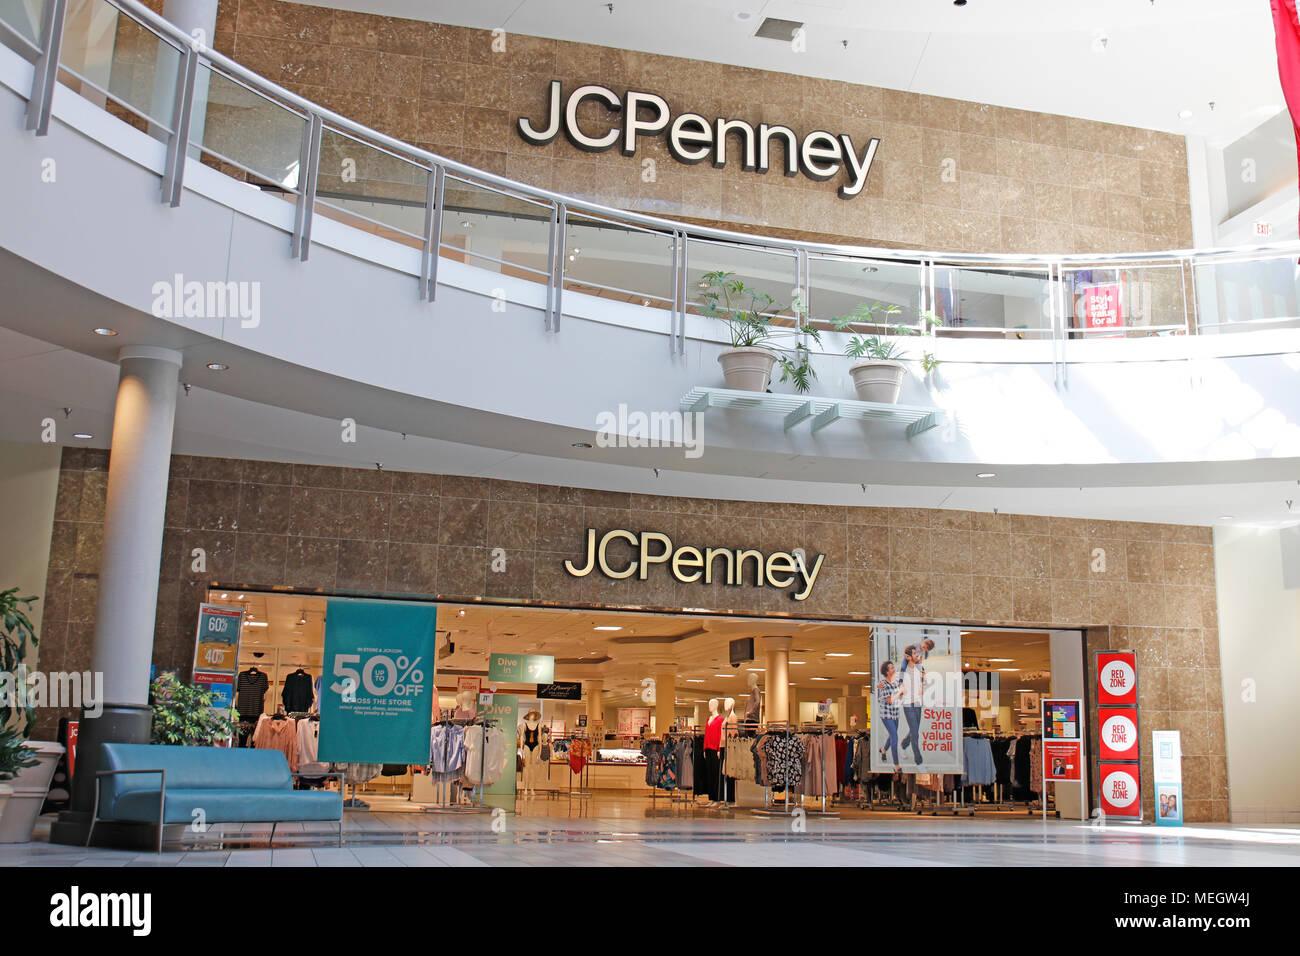 C J Store Imágenes De Stock & C J Store Fotos De Stock - Alamy